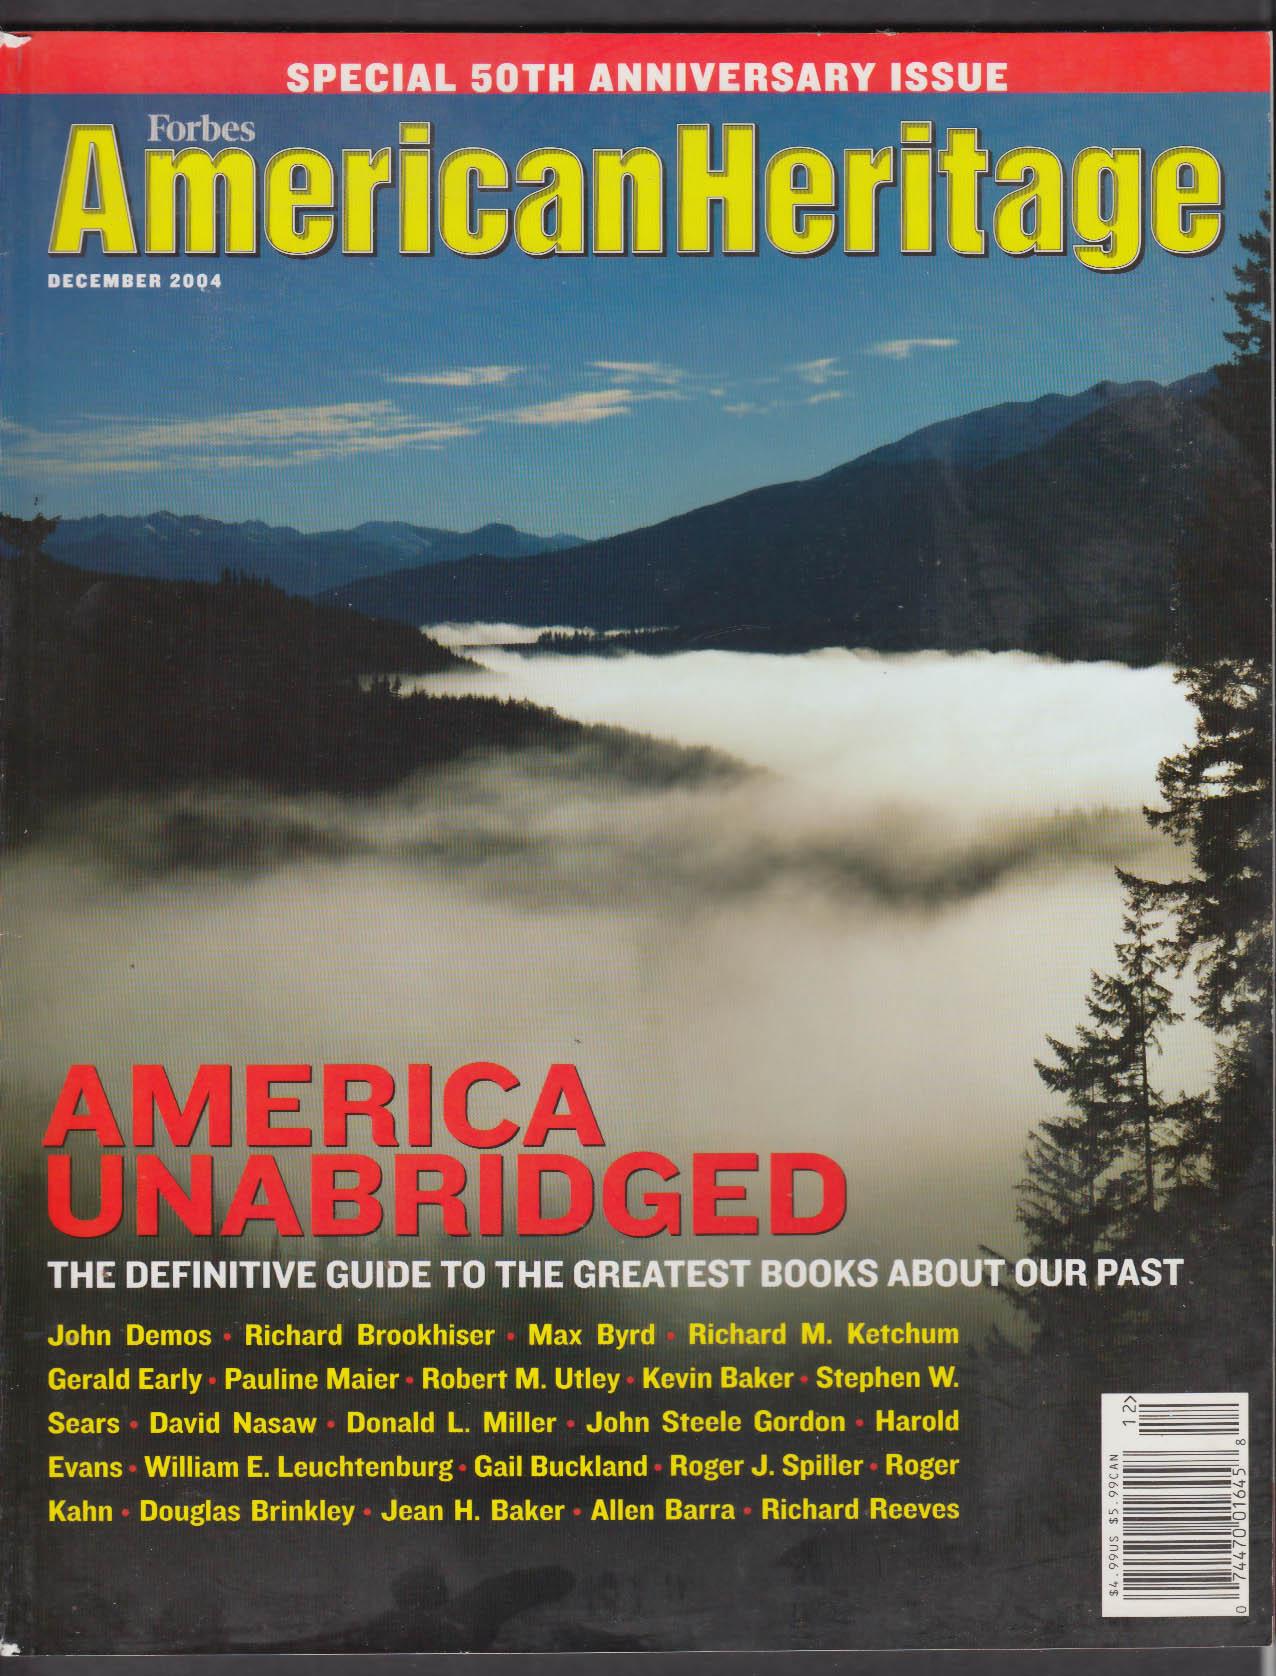 AMERICAN HERITAGE 50th Anniversary Issue: America Unabridged 12 2004